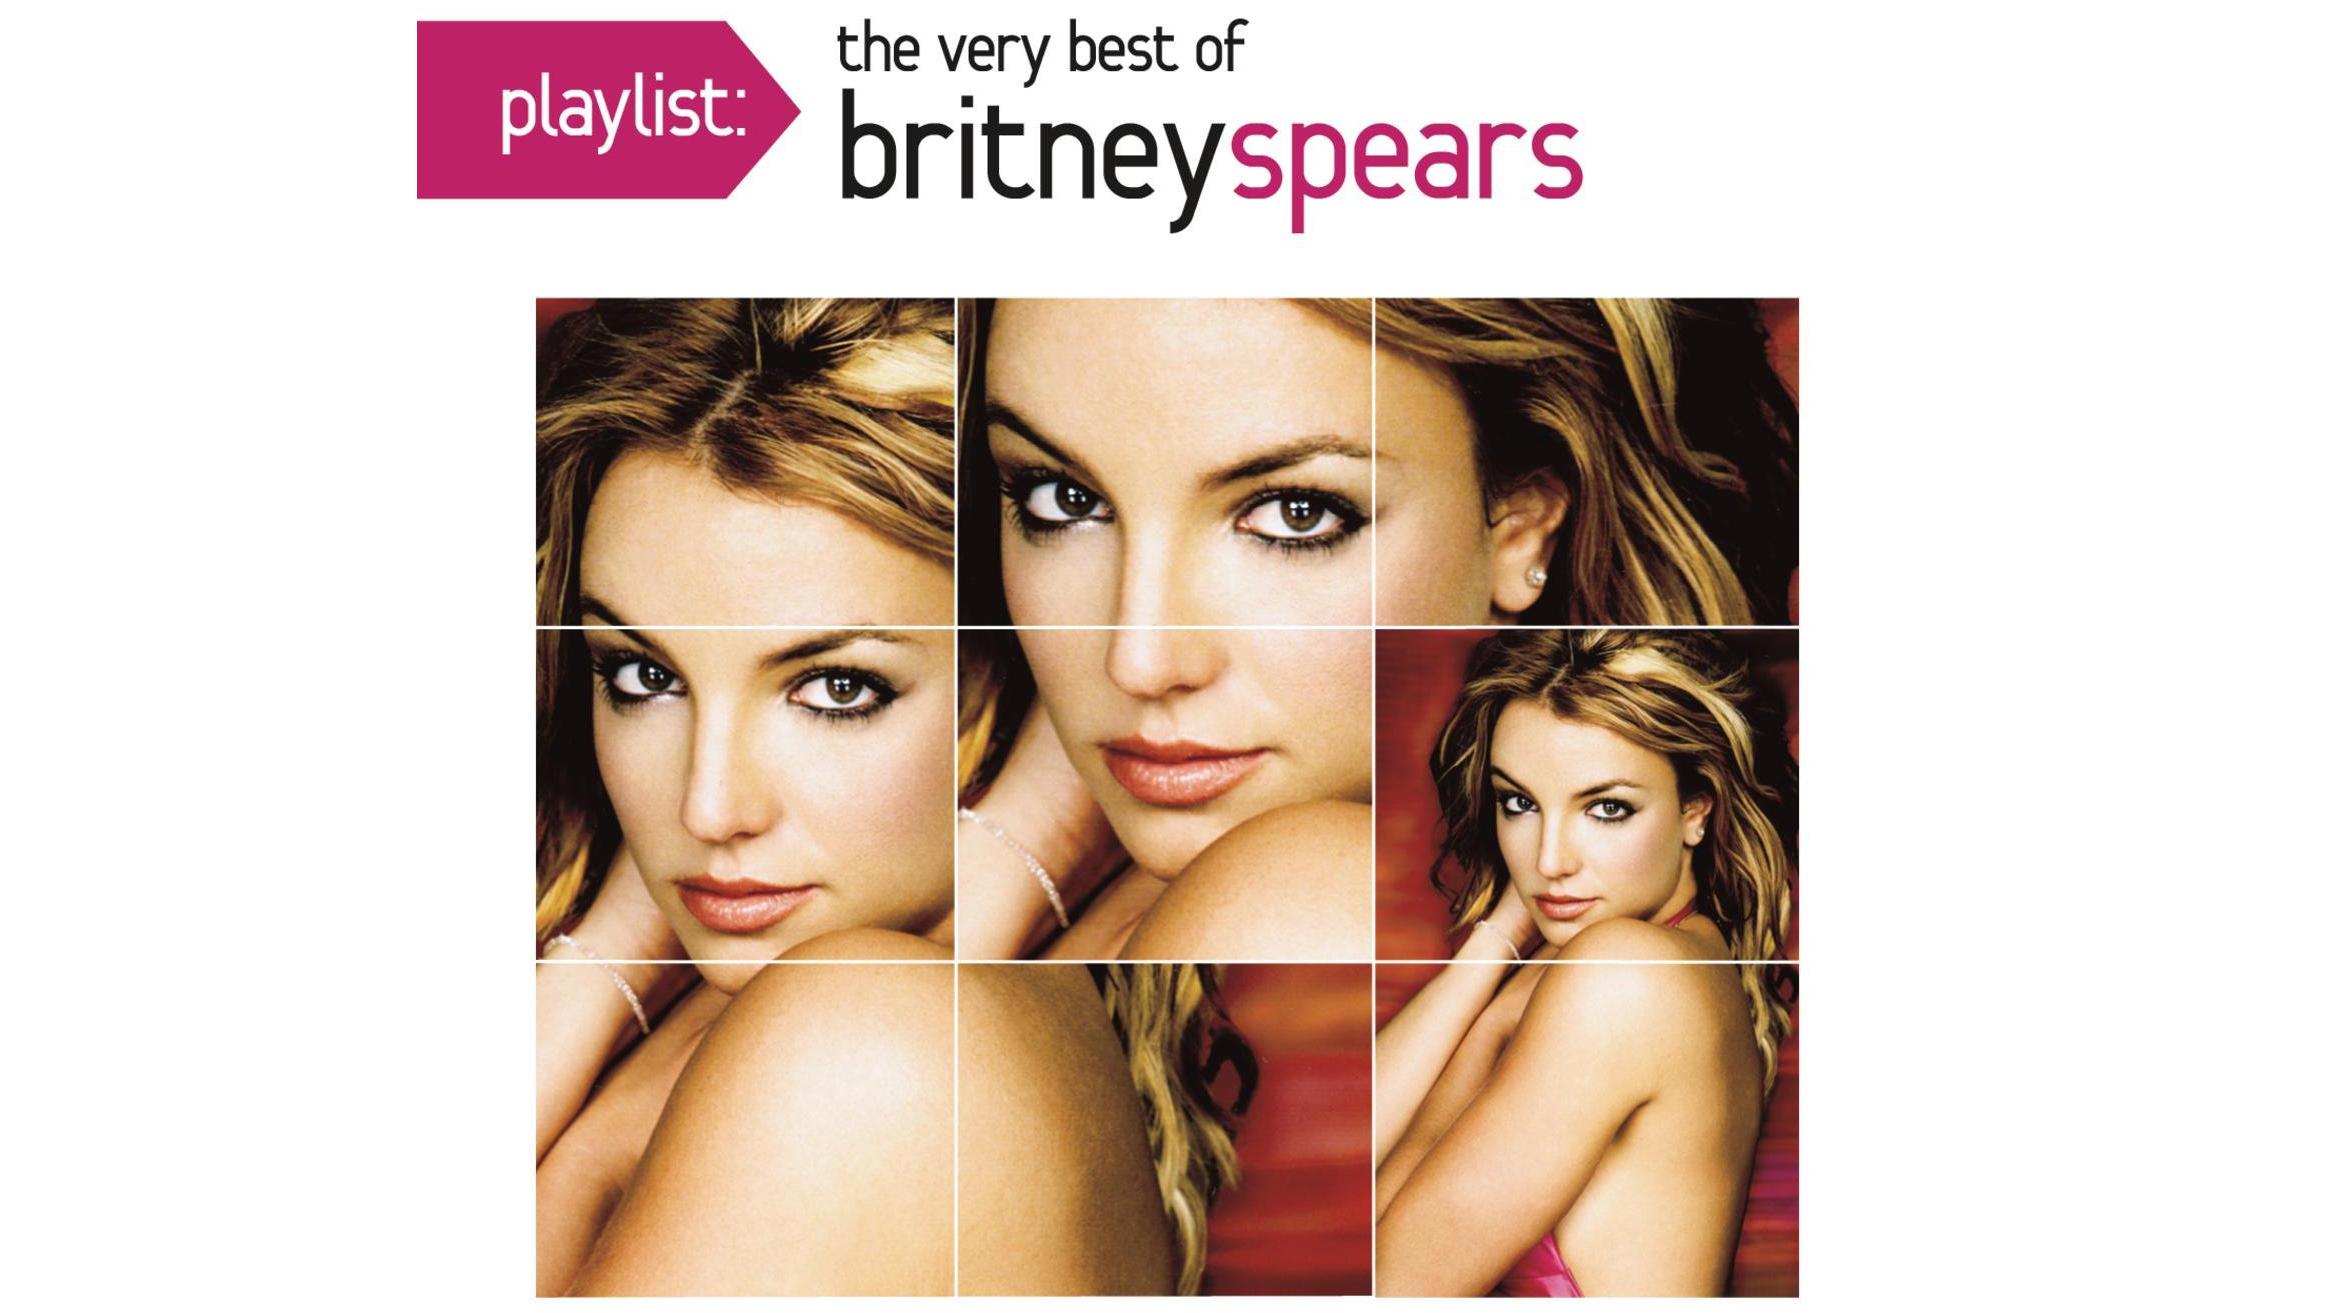 playlist-very-best-britney-spears-album-art